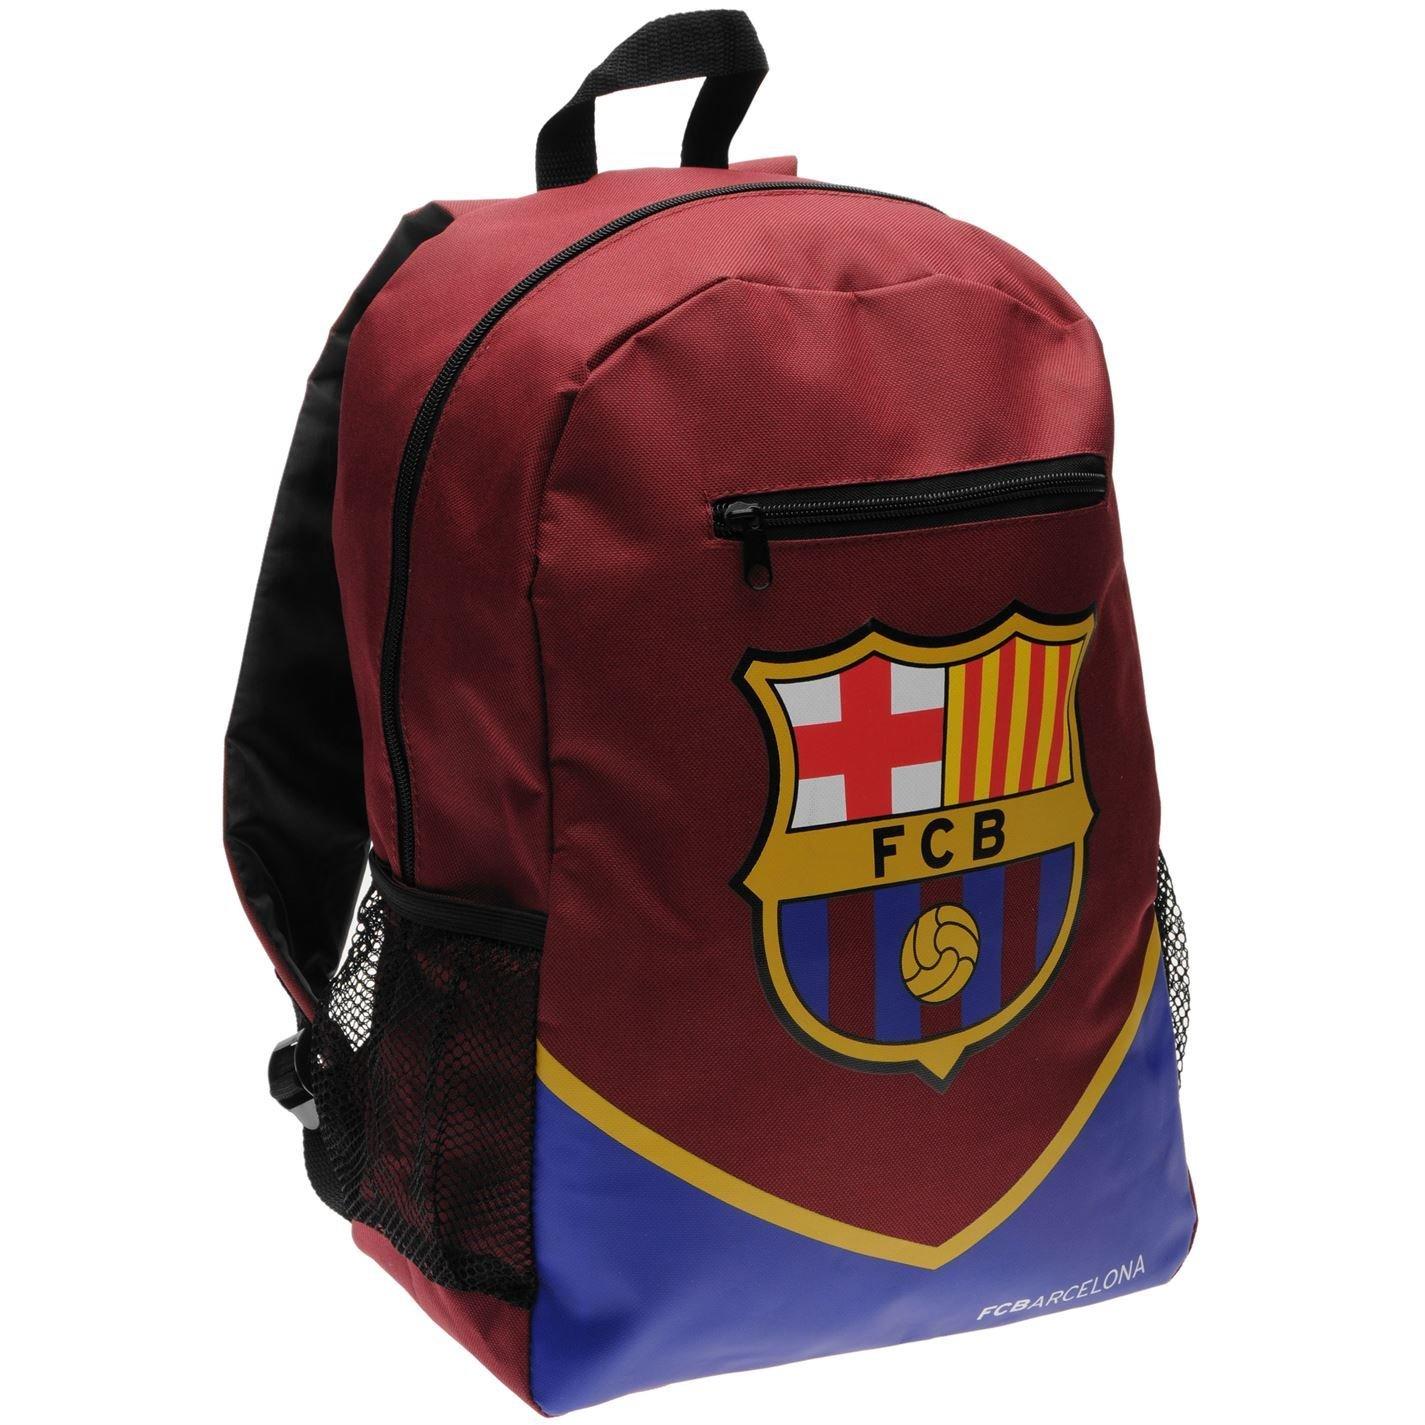 Barcelona  Red blueee Football Club Backpack Soccer Team Bag Rucksack H 42 x W 38 x D 20 (cm) Glasgow Rangers  blueee White